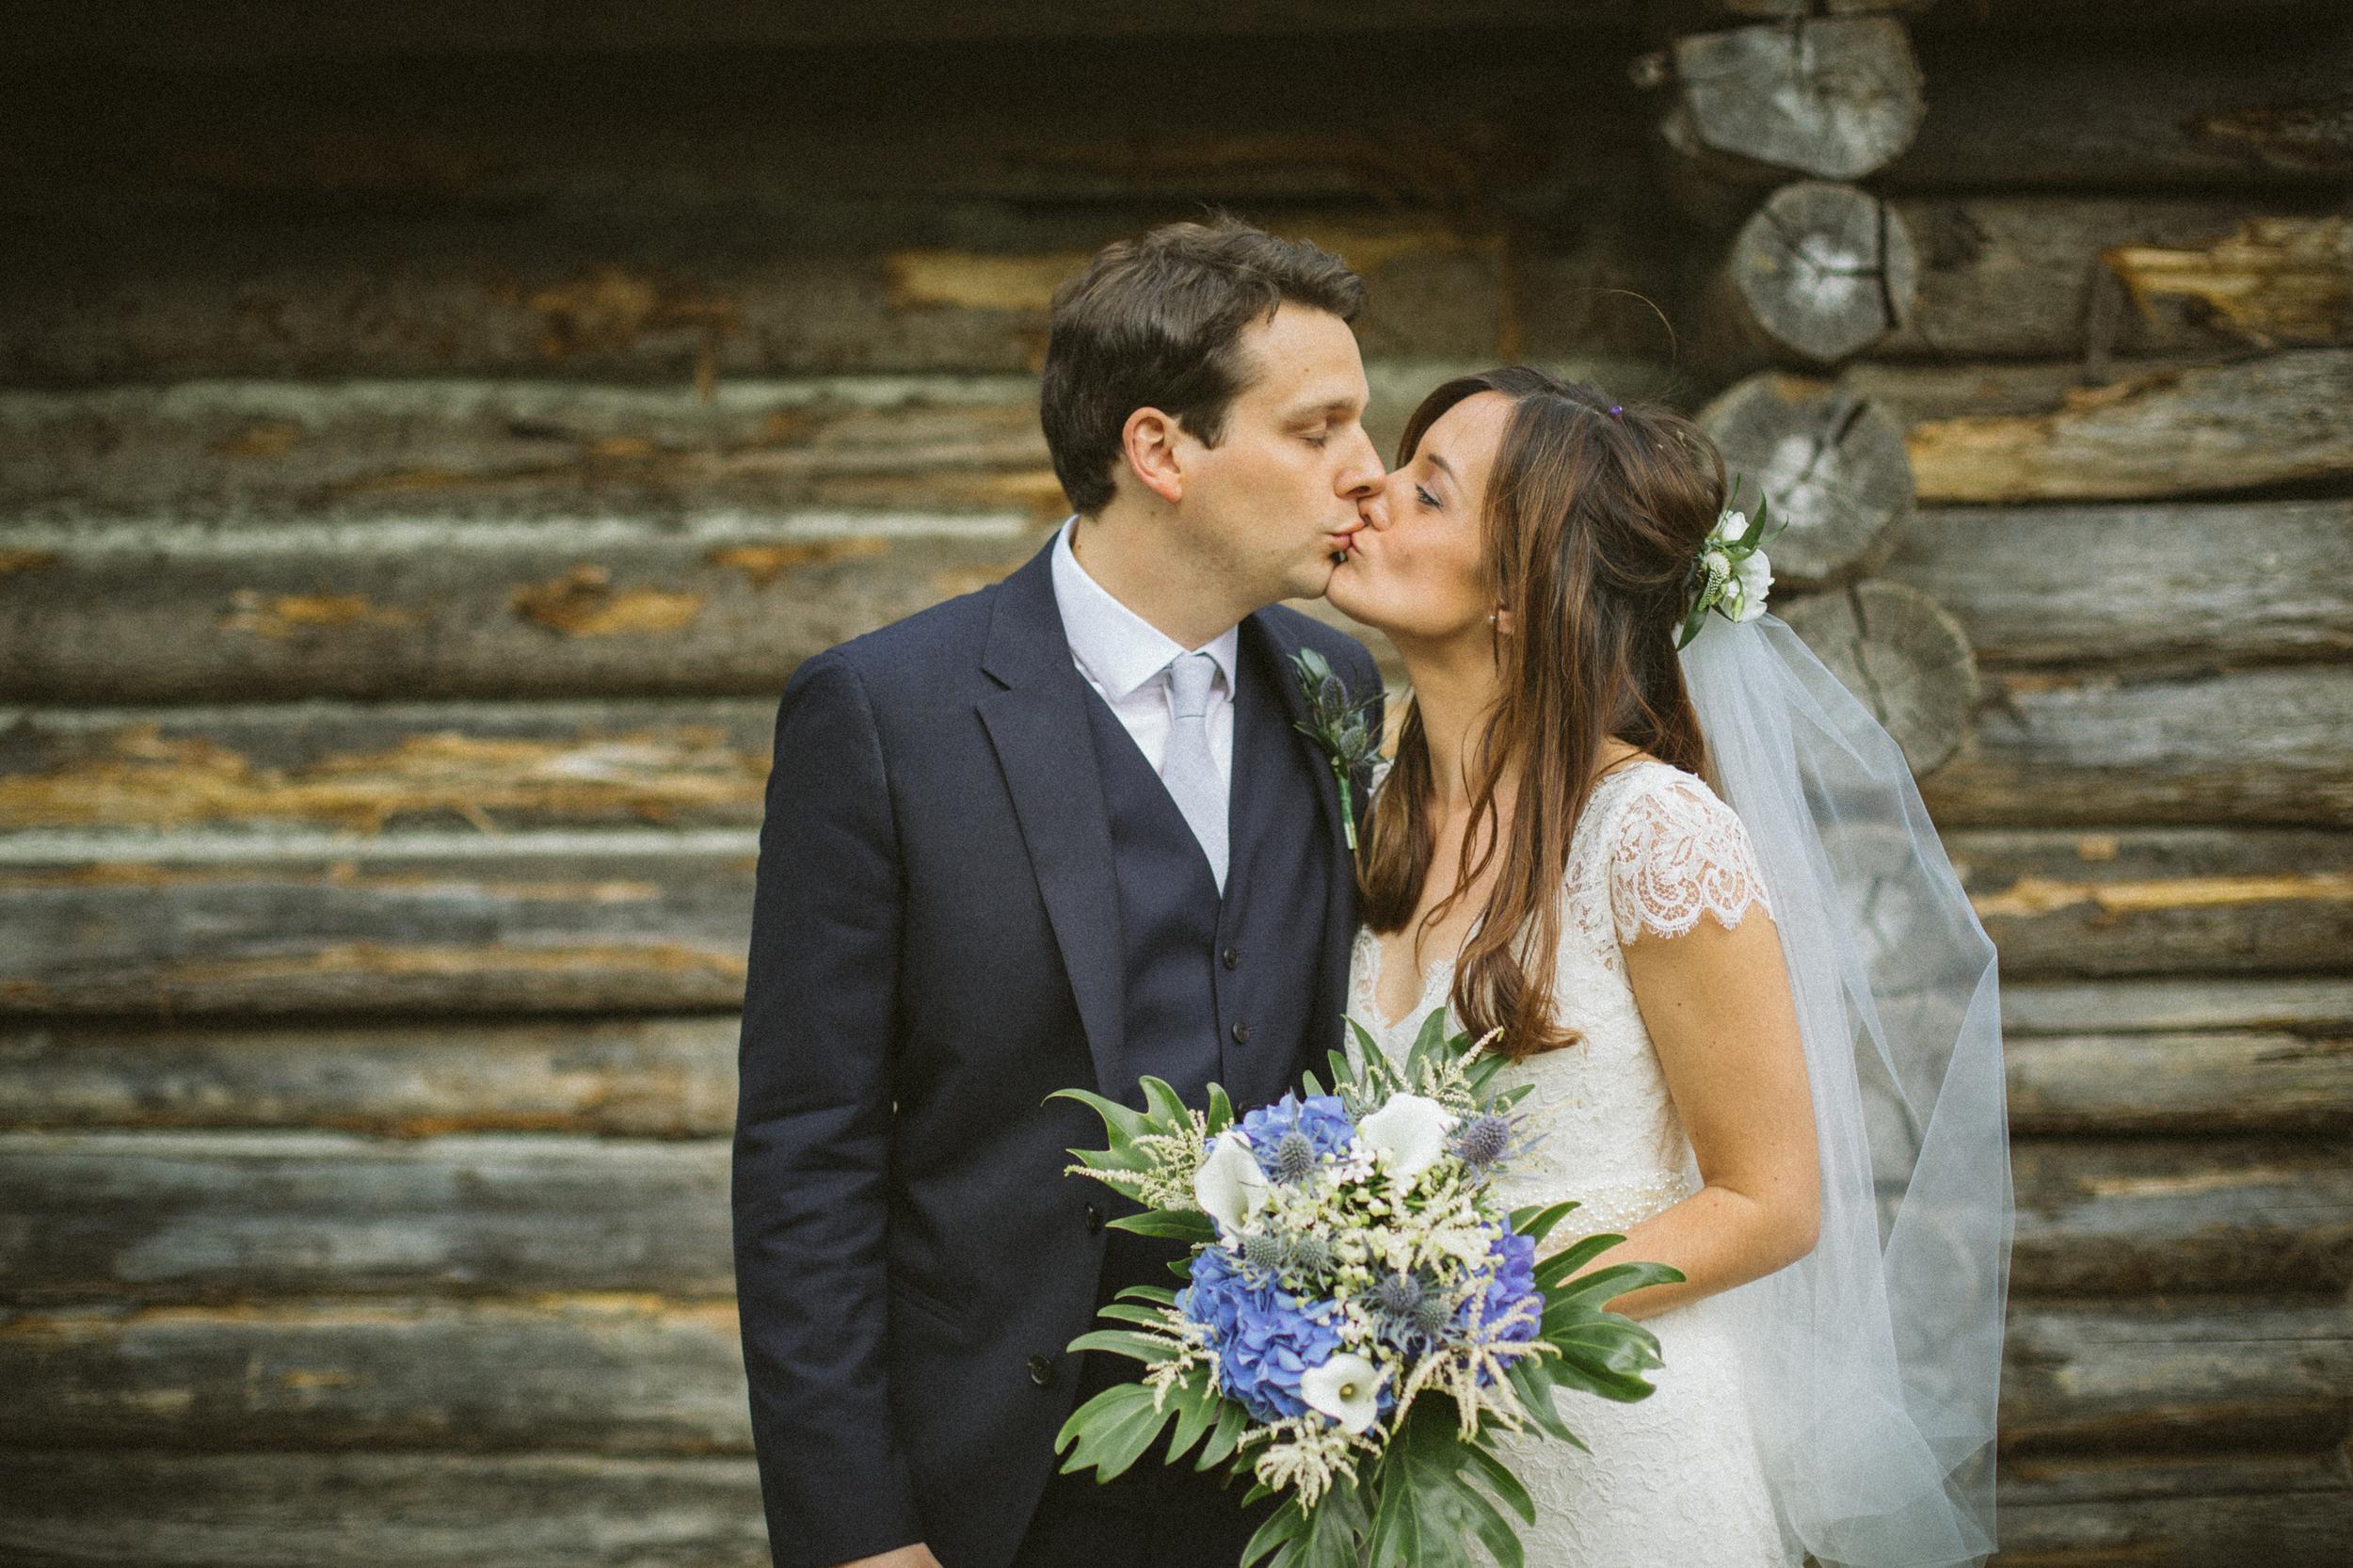 barnes-wedding-wetlands-centre -london-uk-wedding-photography-Adam-Rowley